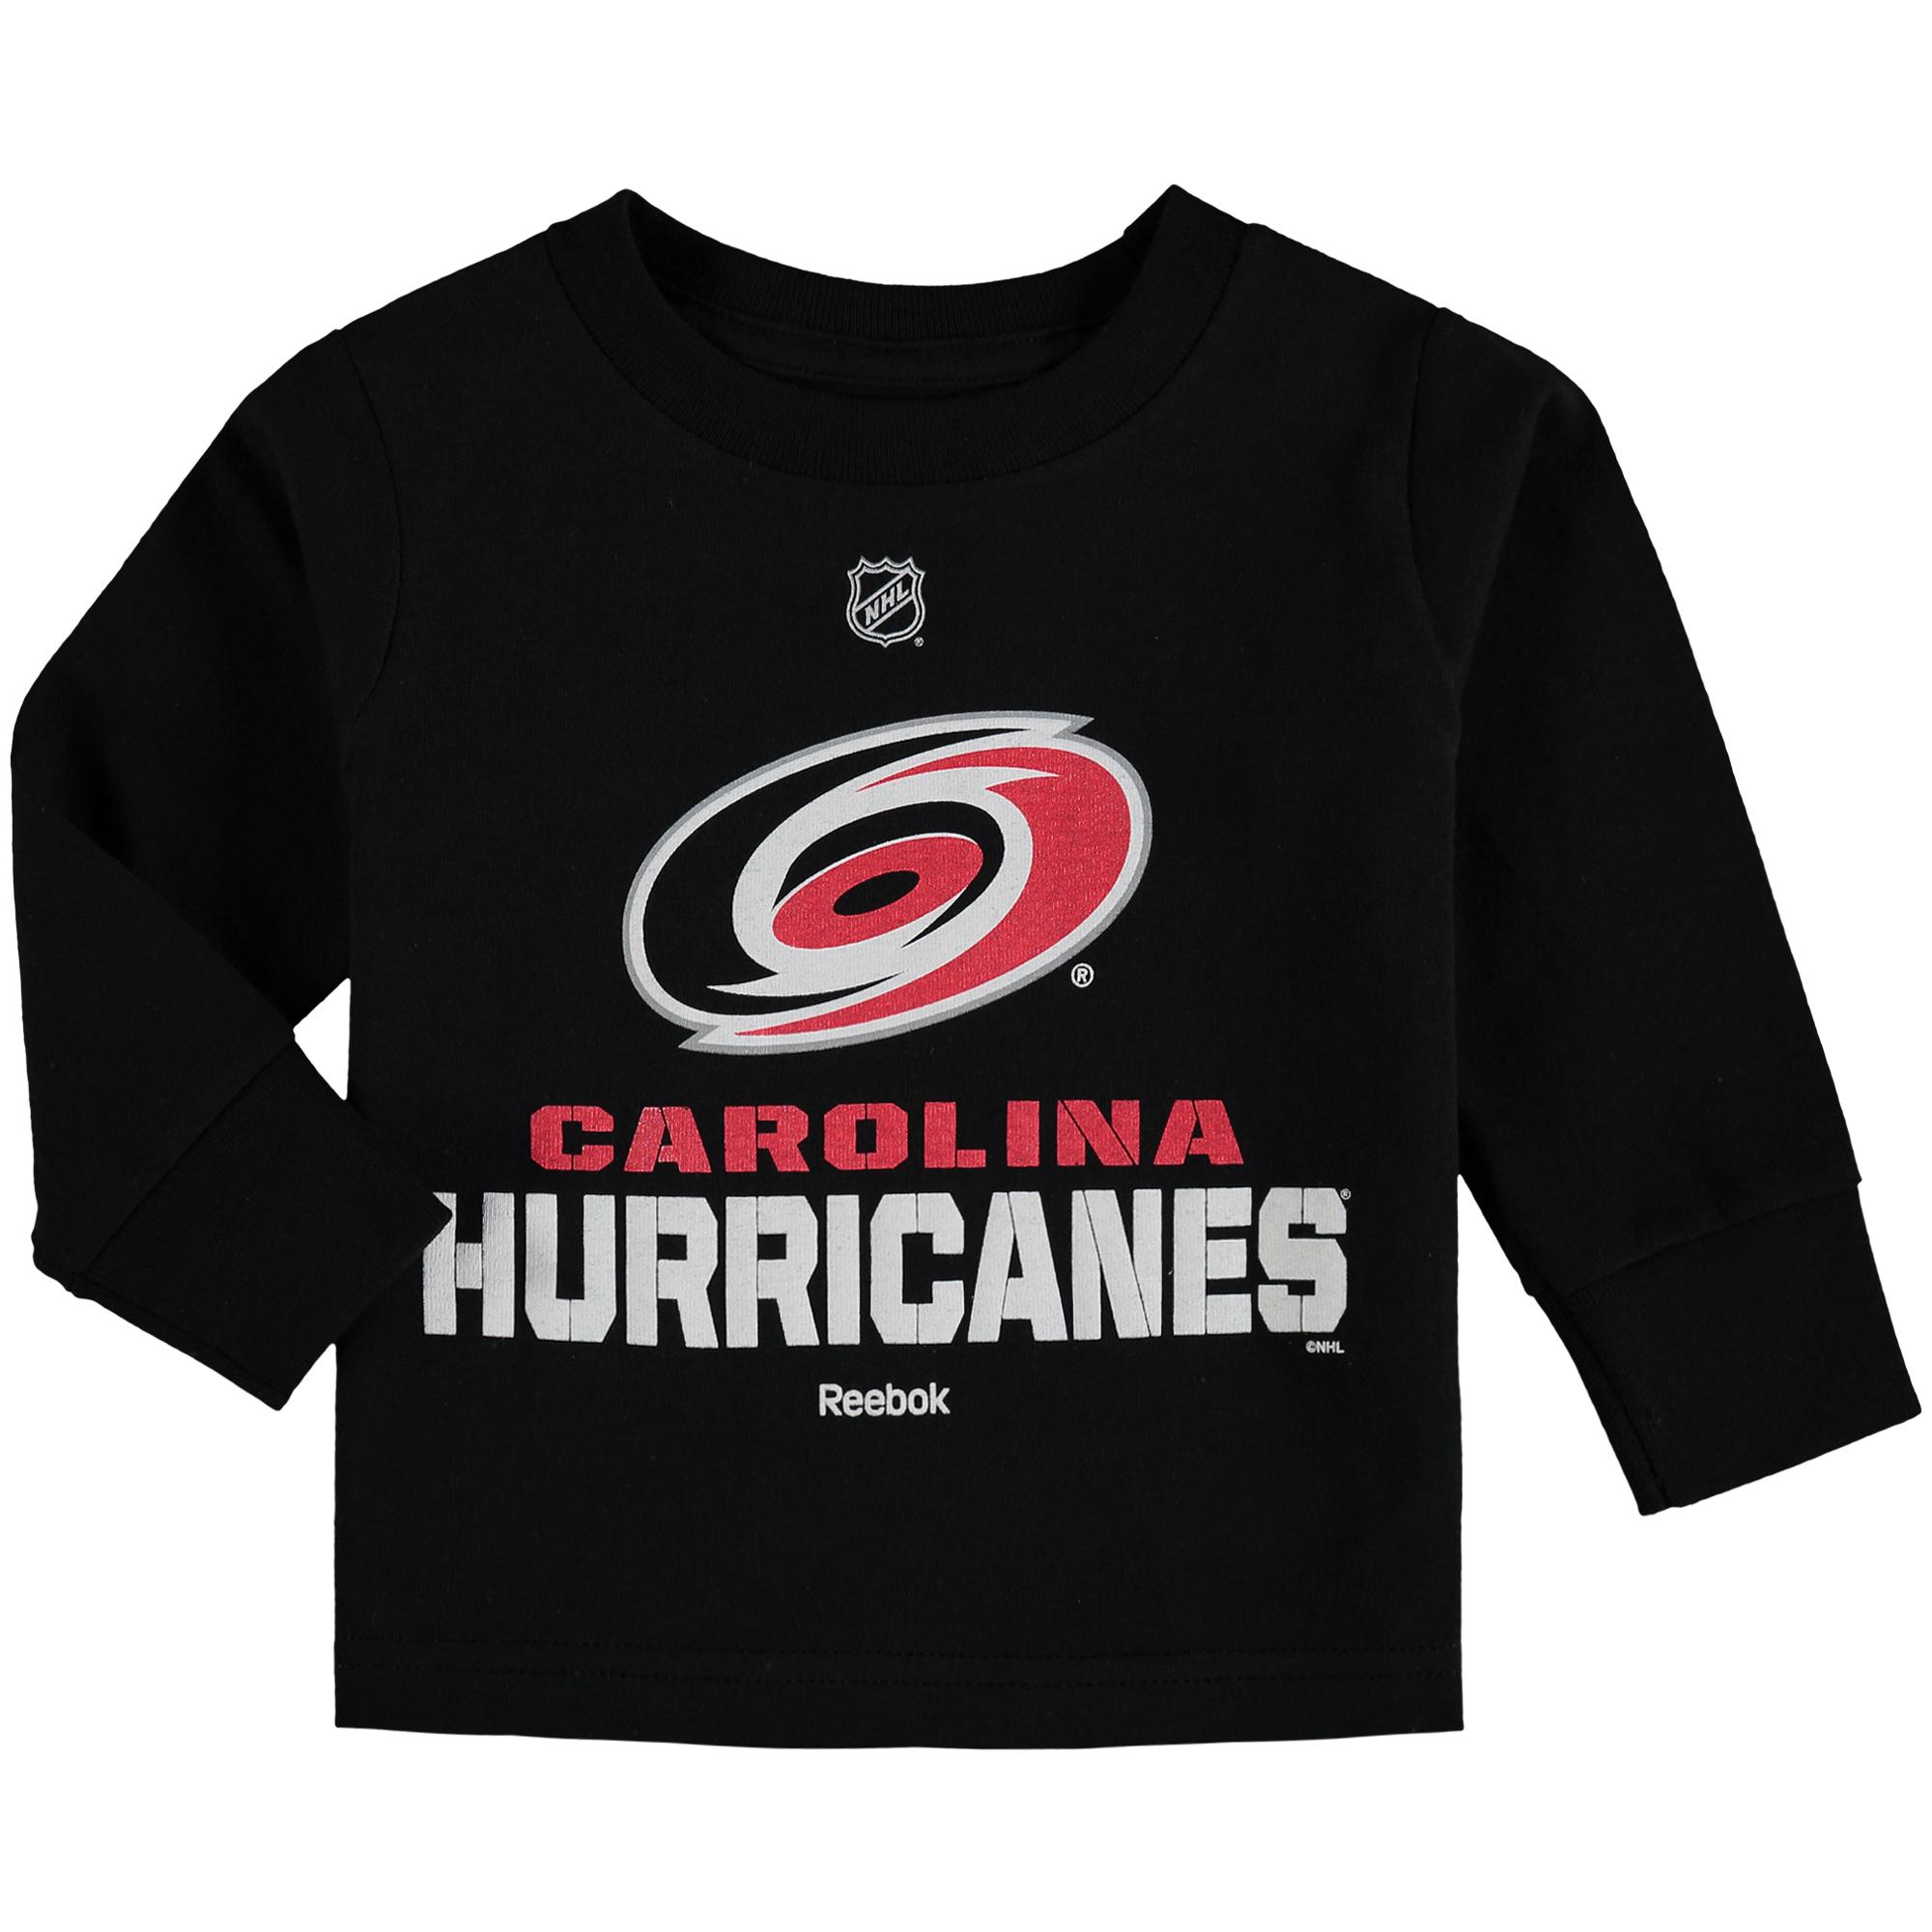 Carolina Hurricanes Reebok Toddler Clean Cut Long Sleeve T-Shirt - Black